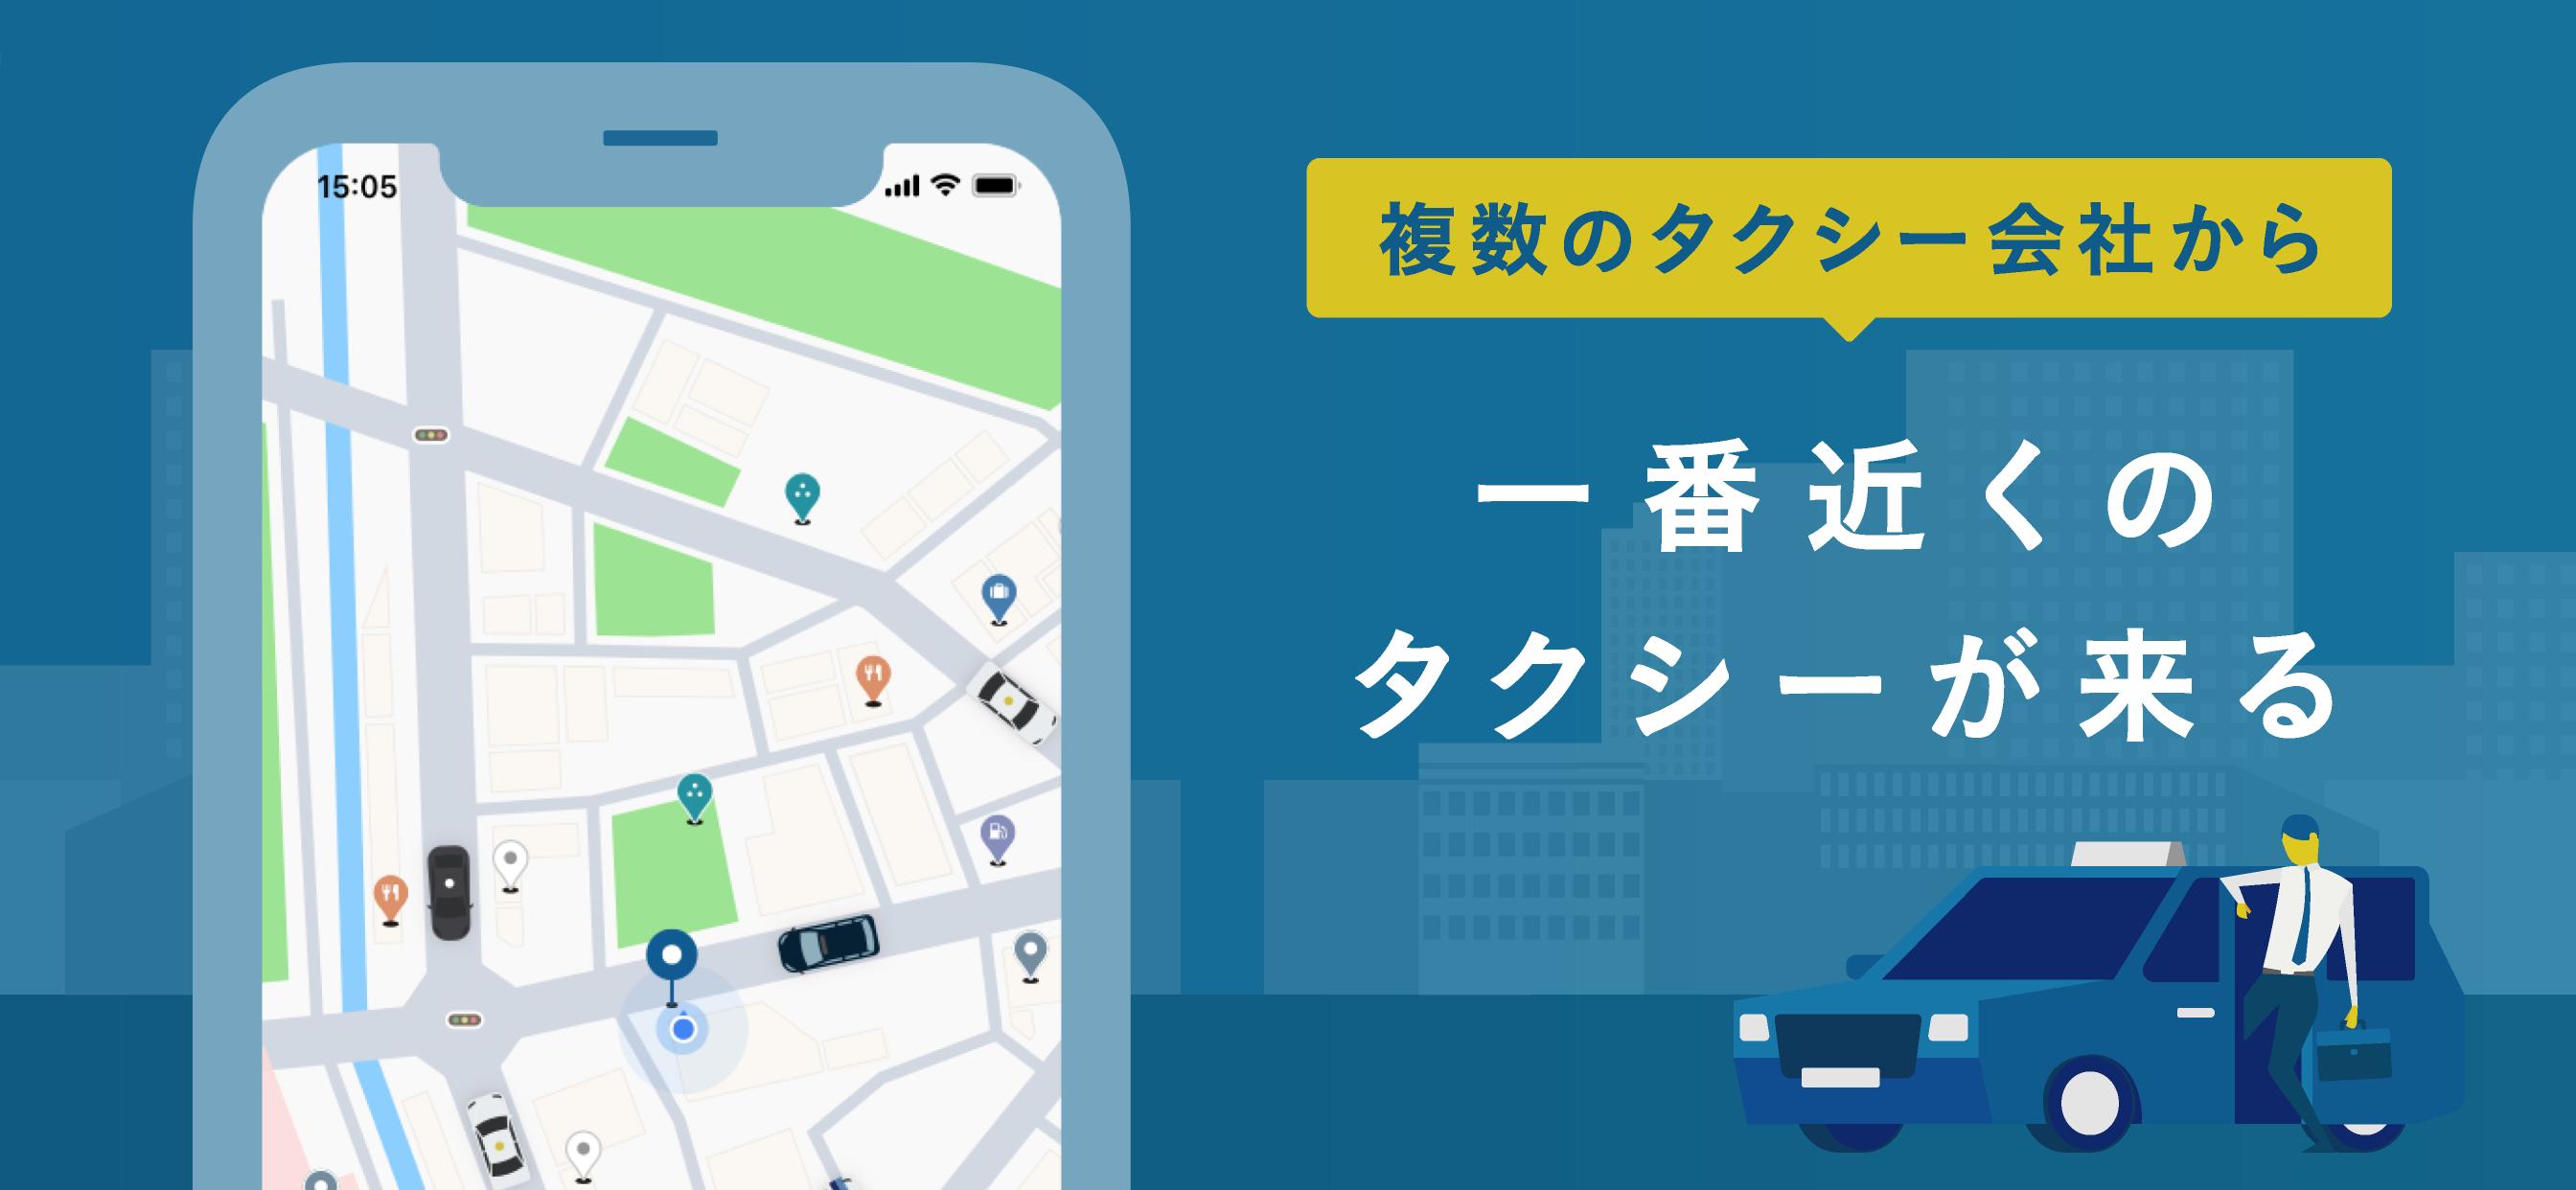 app_image_01.png